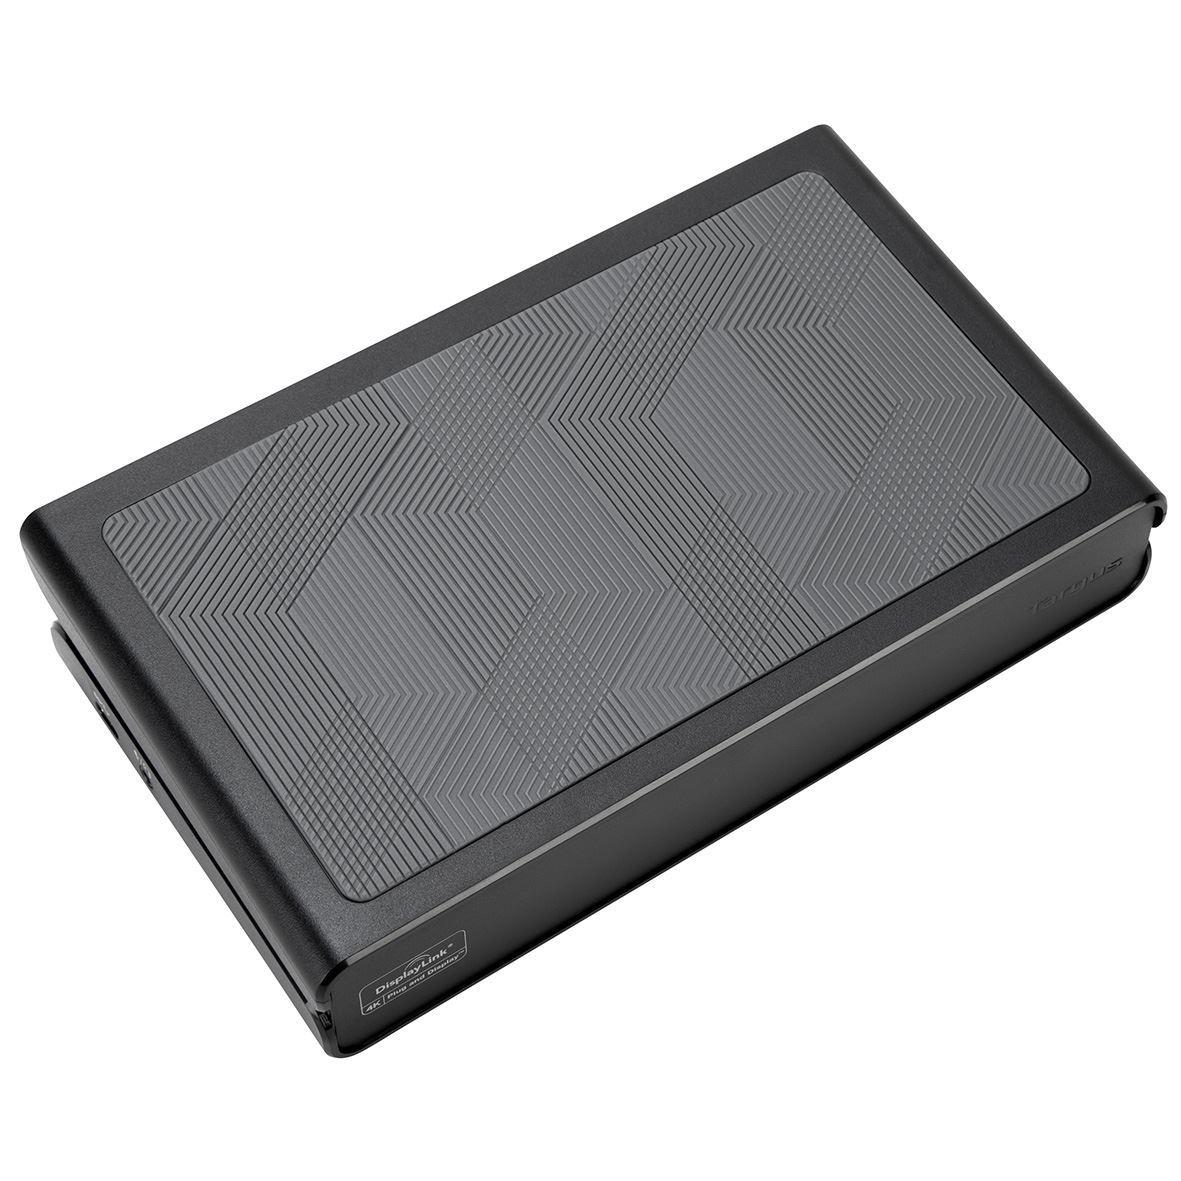 1181x1181 Universal Usb 3.0 Dv4k Docking Station With Laptop Power